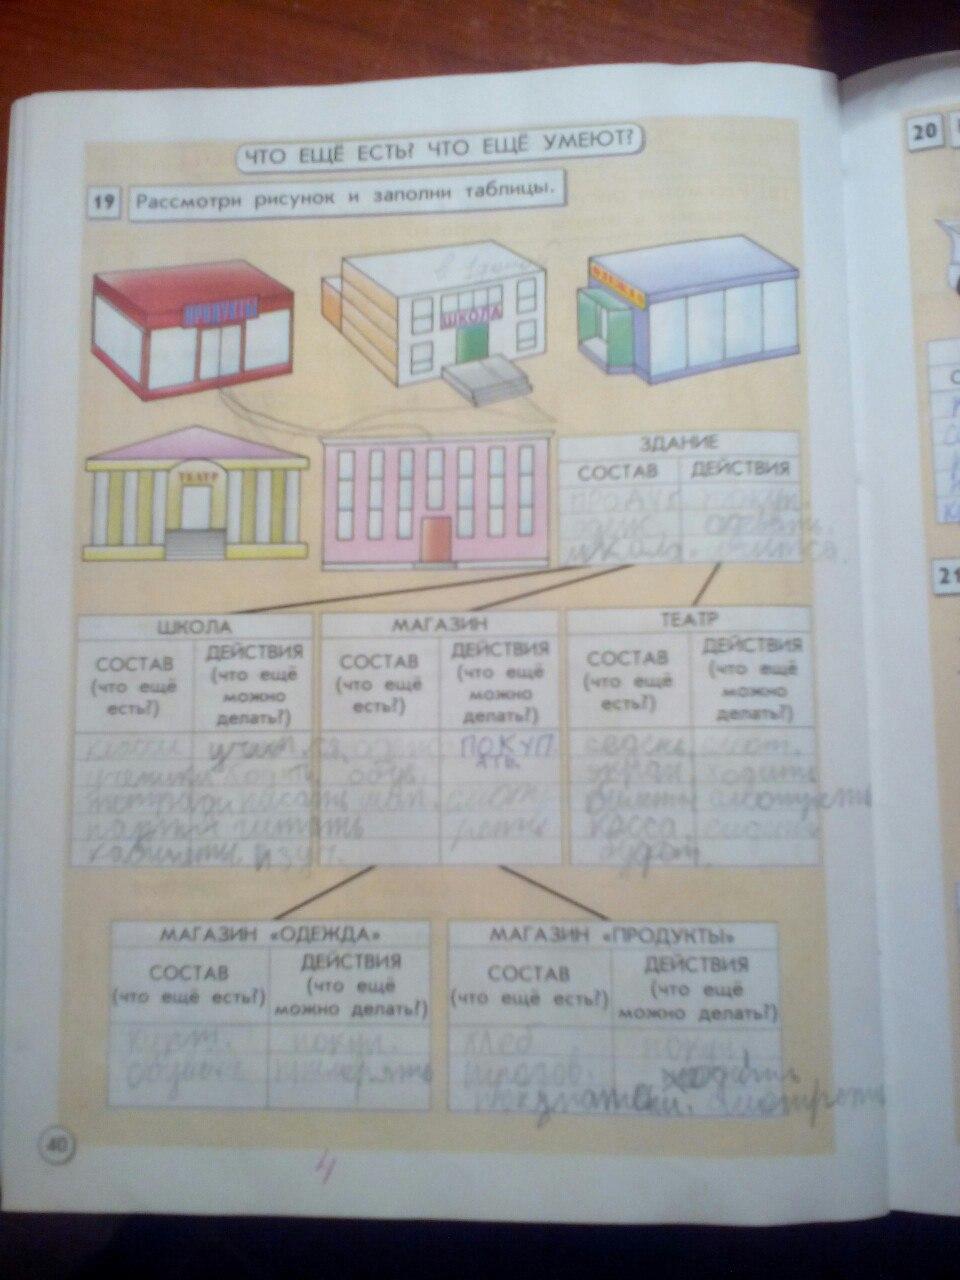 Информатика 3 класс горячев решебник онлайн заполни таблицу